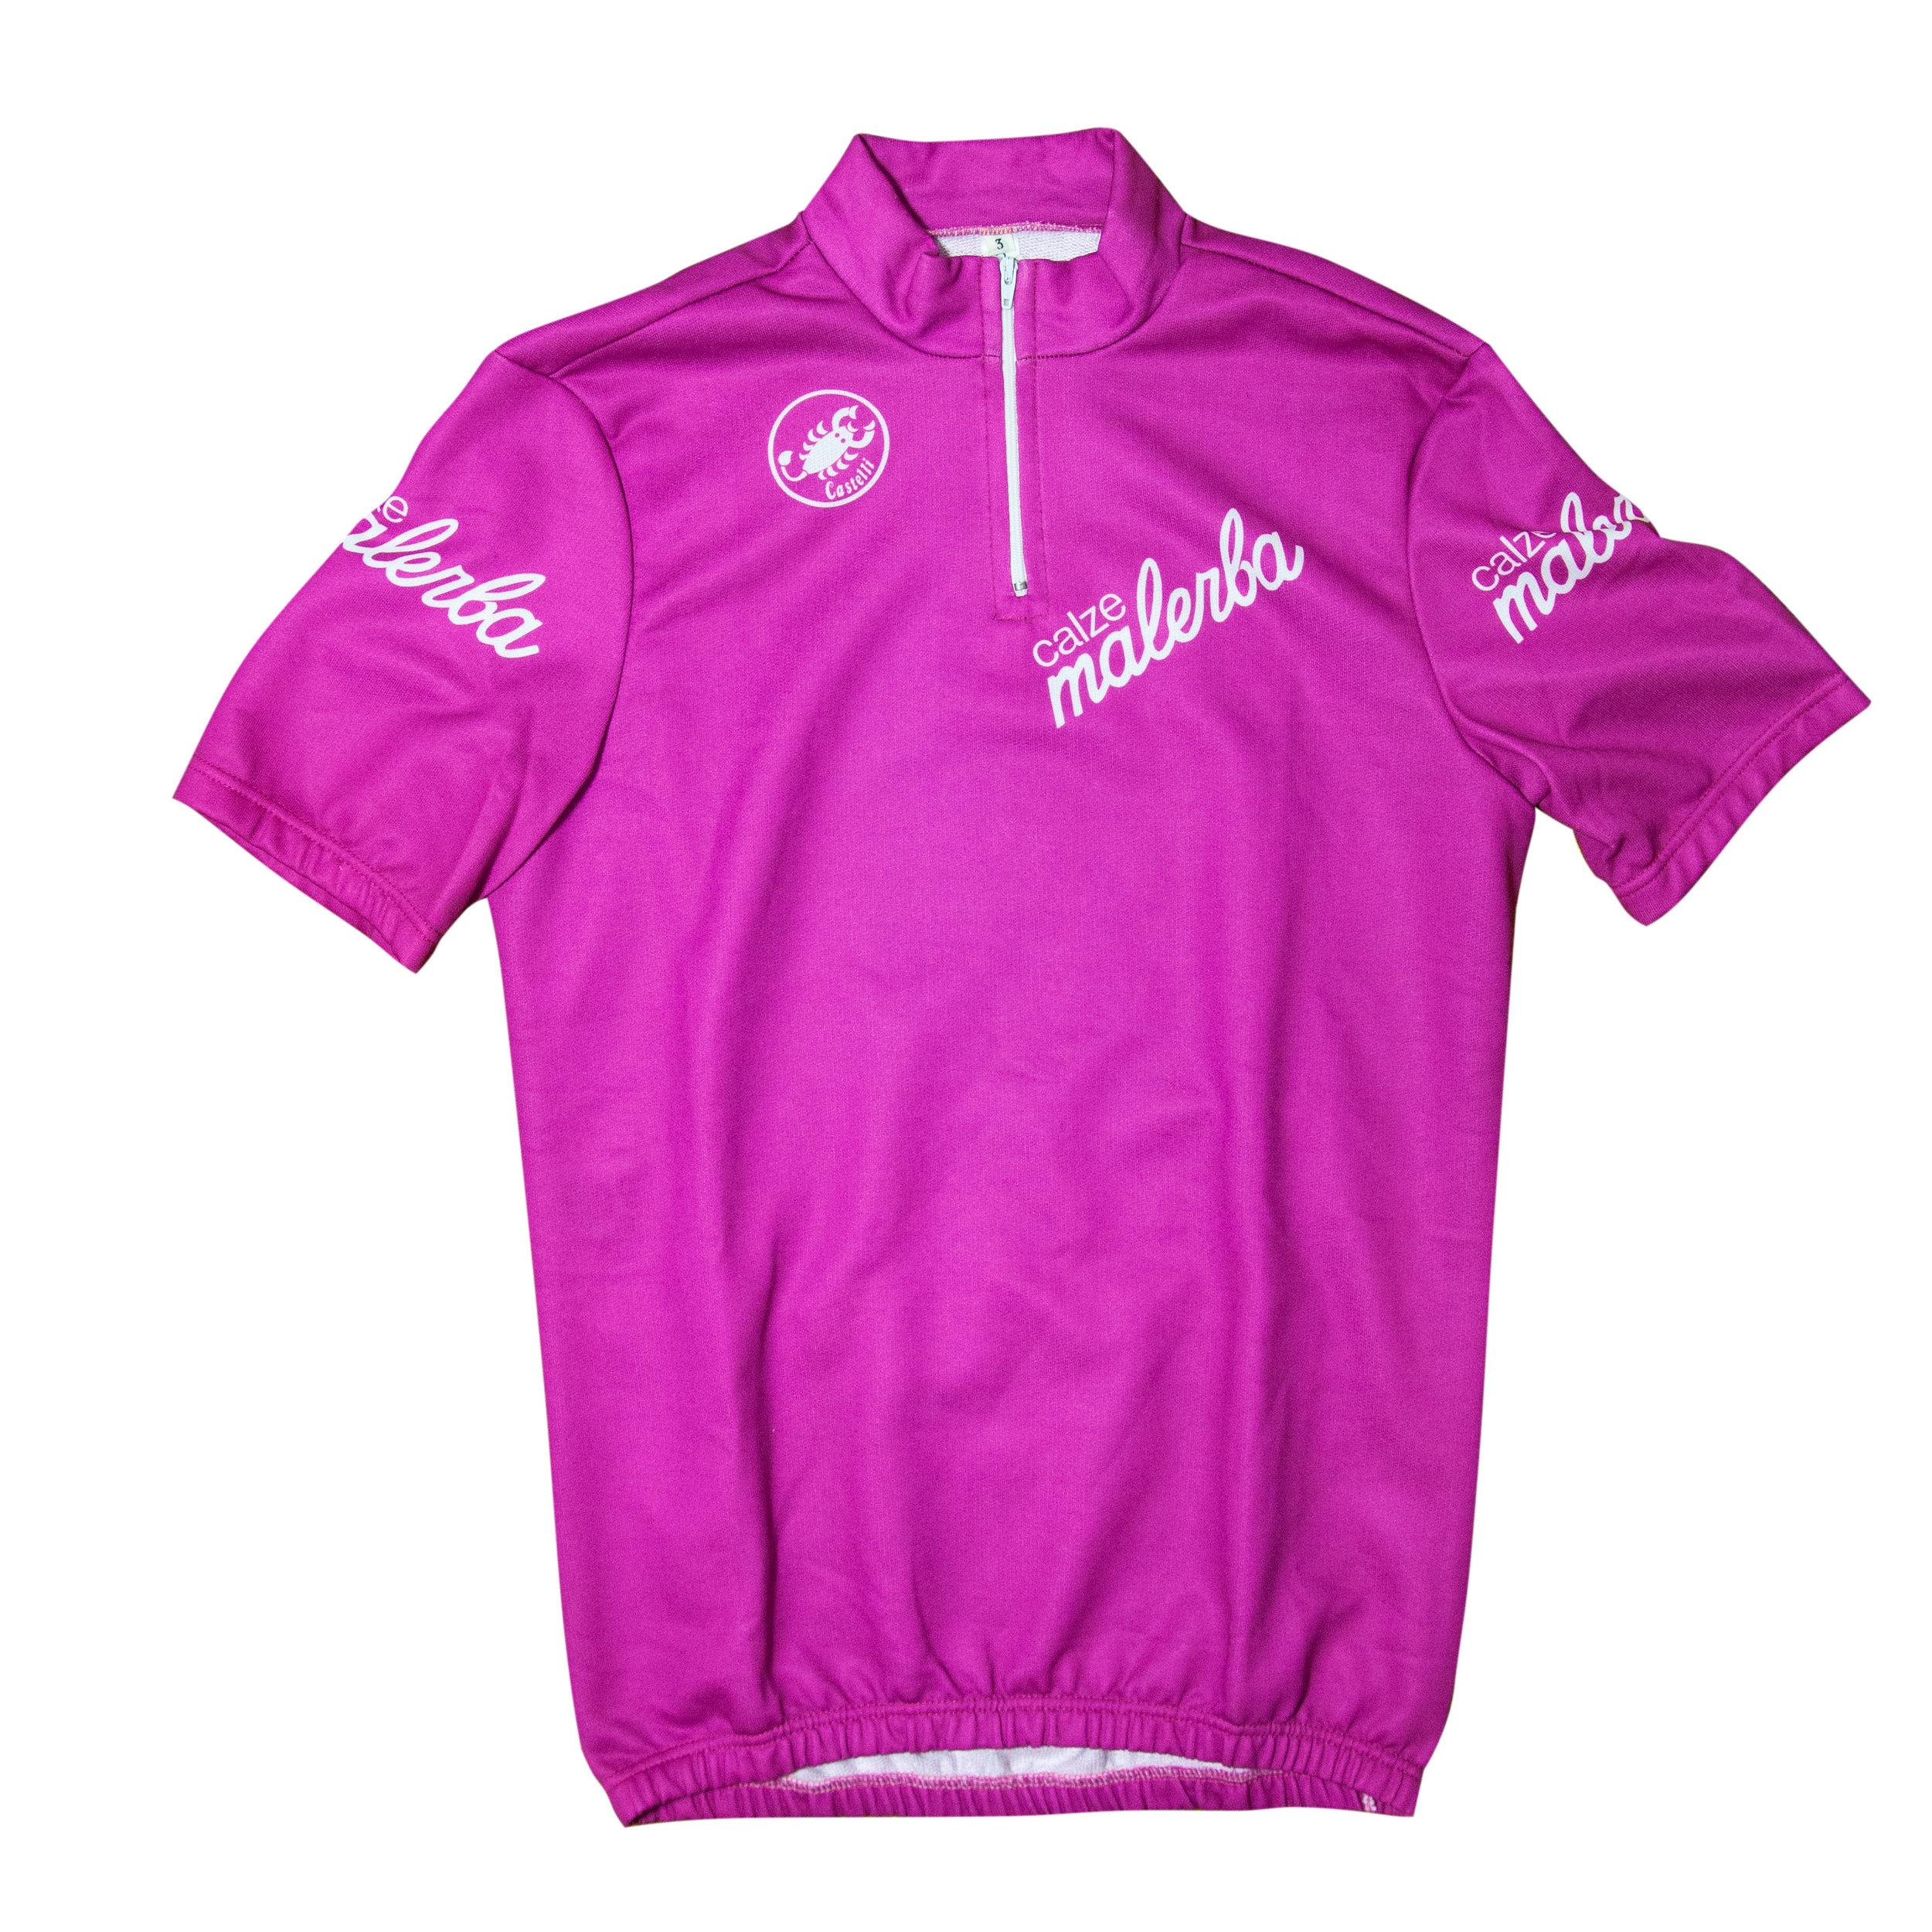 1989---Giro.jpg